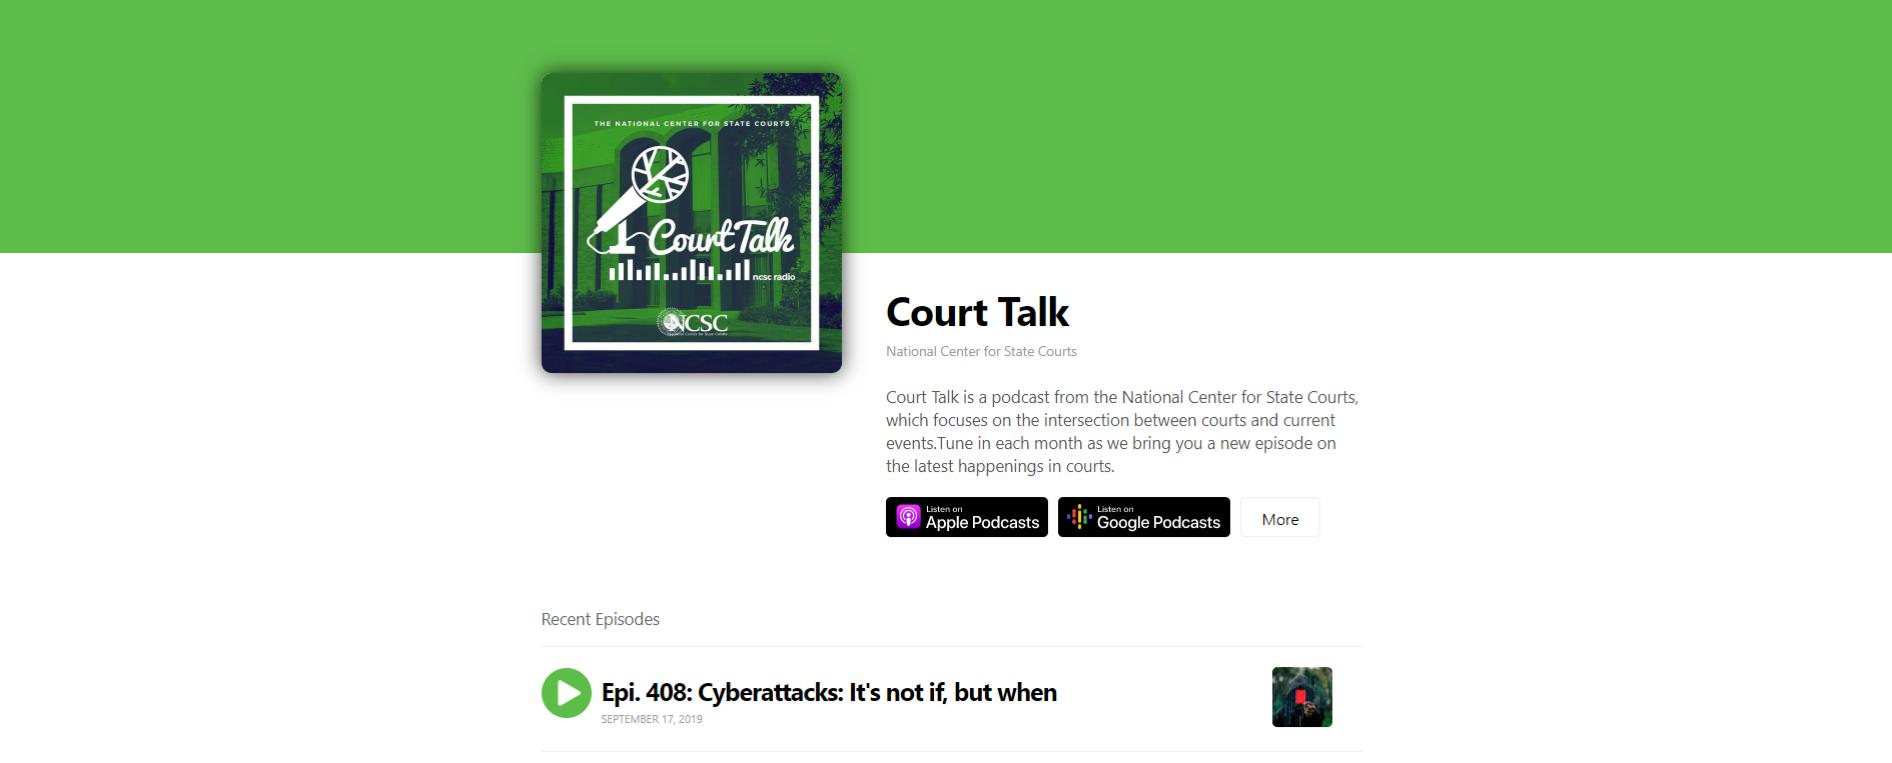 Court Talk podcast